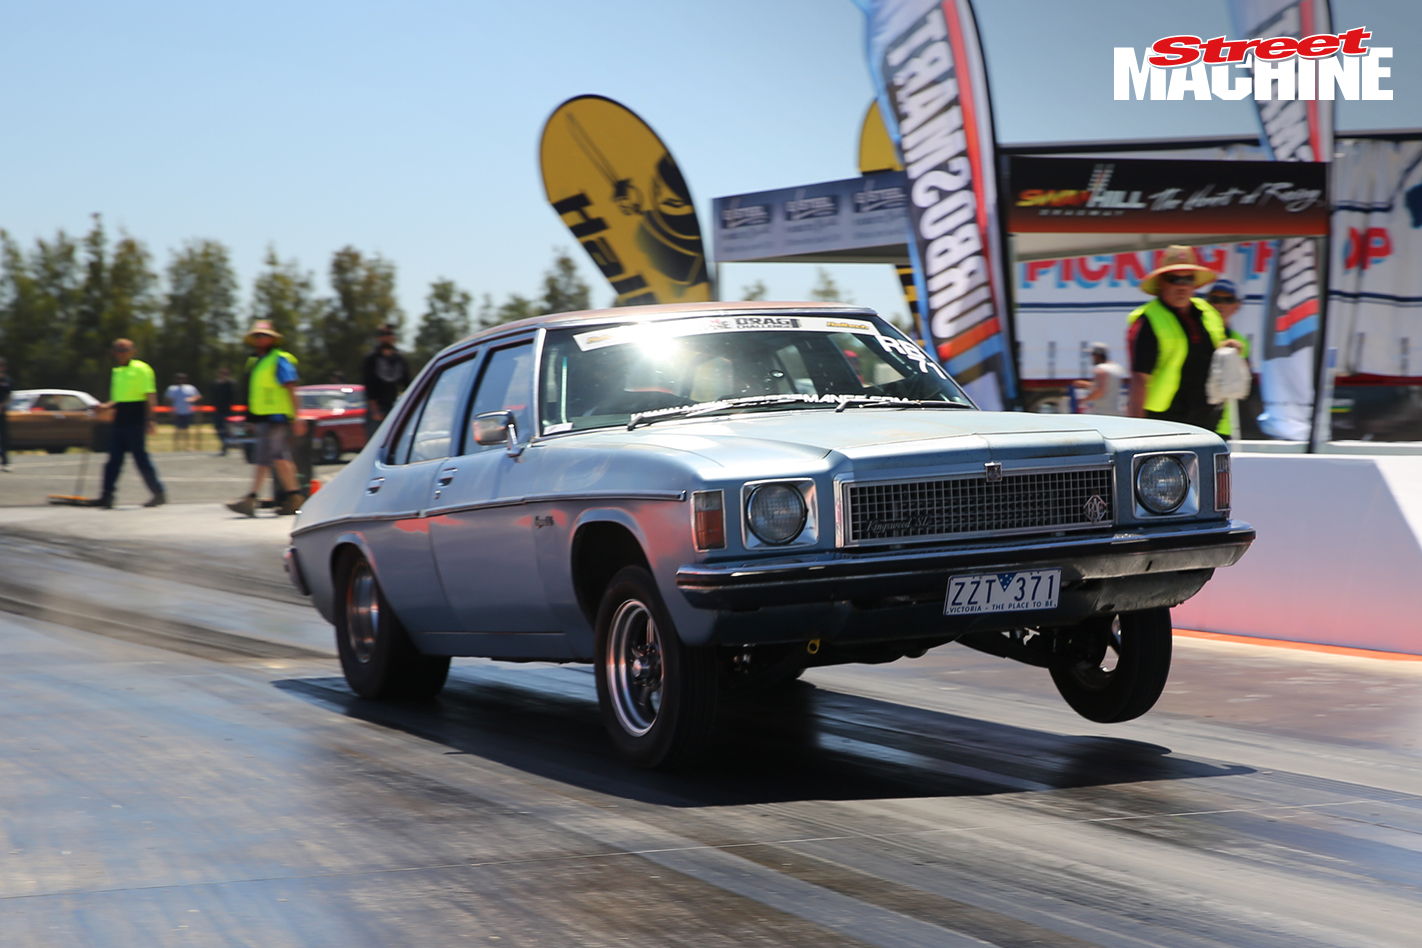 Crusty Torana Lsx Turbo Drag Challenge